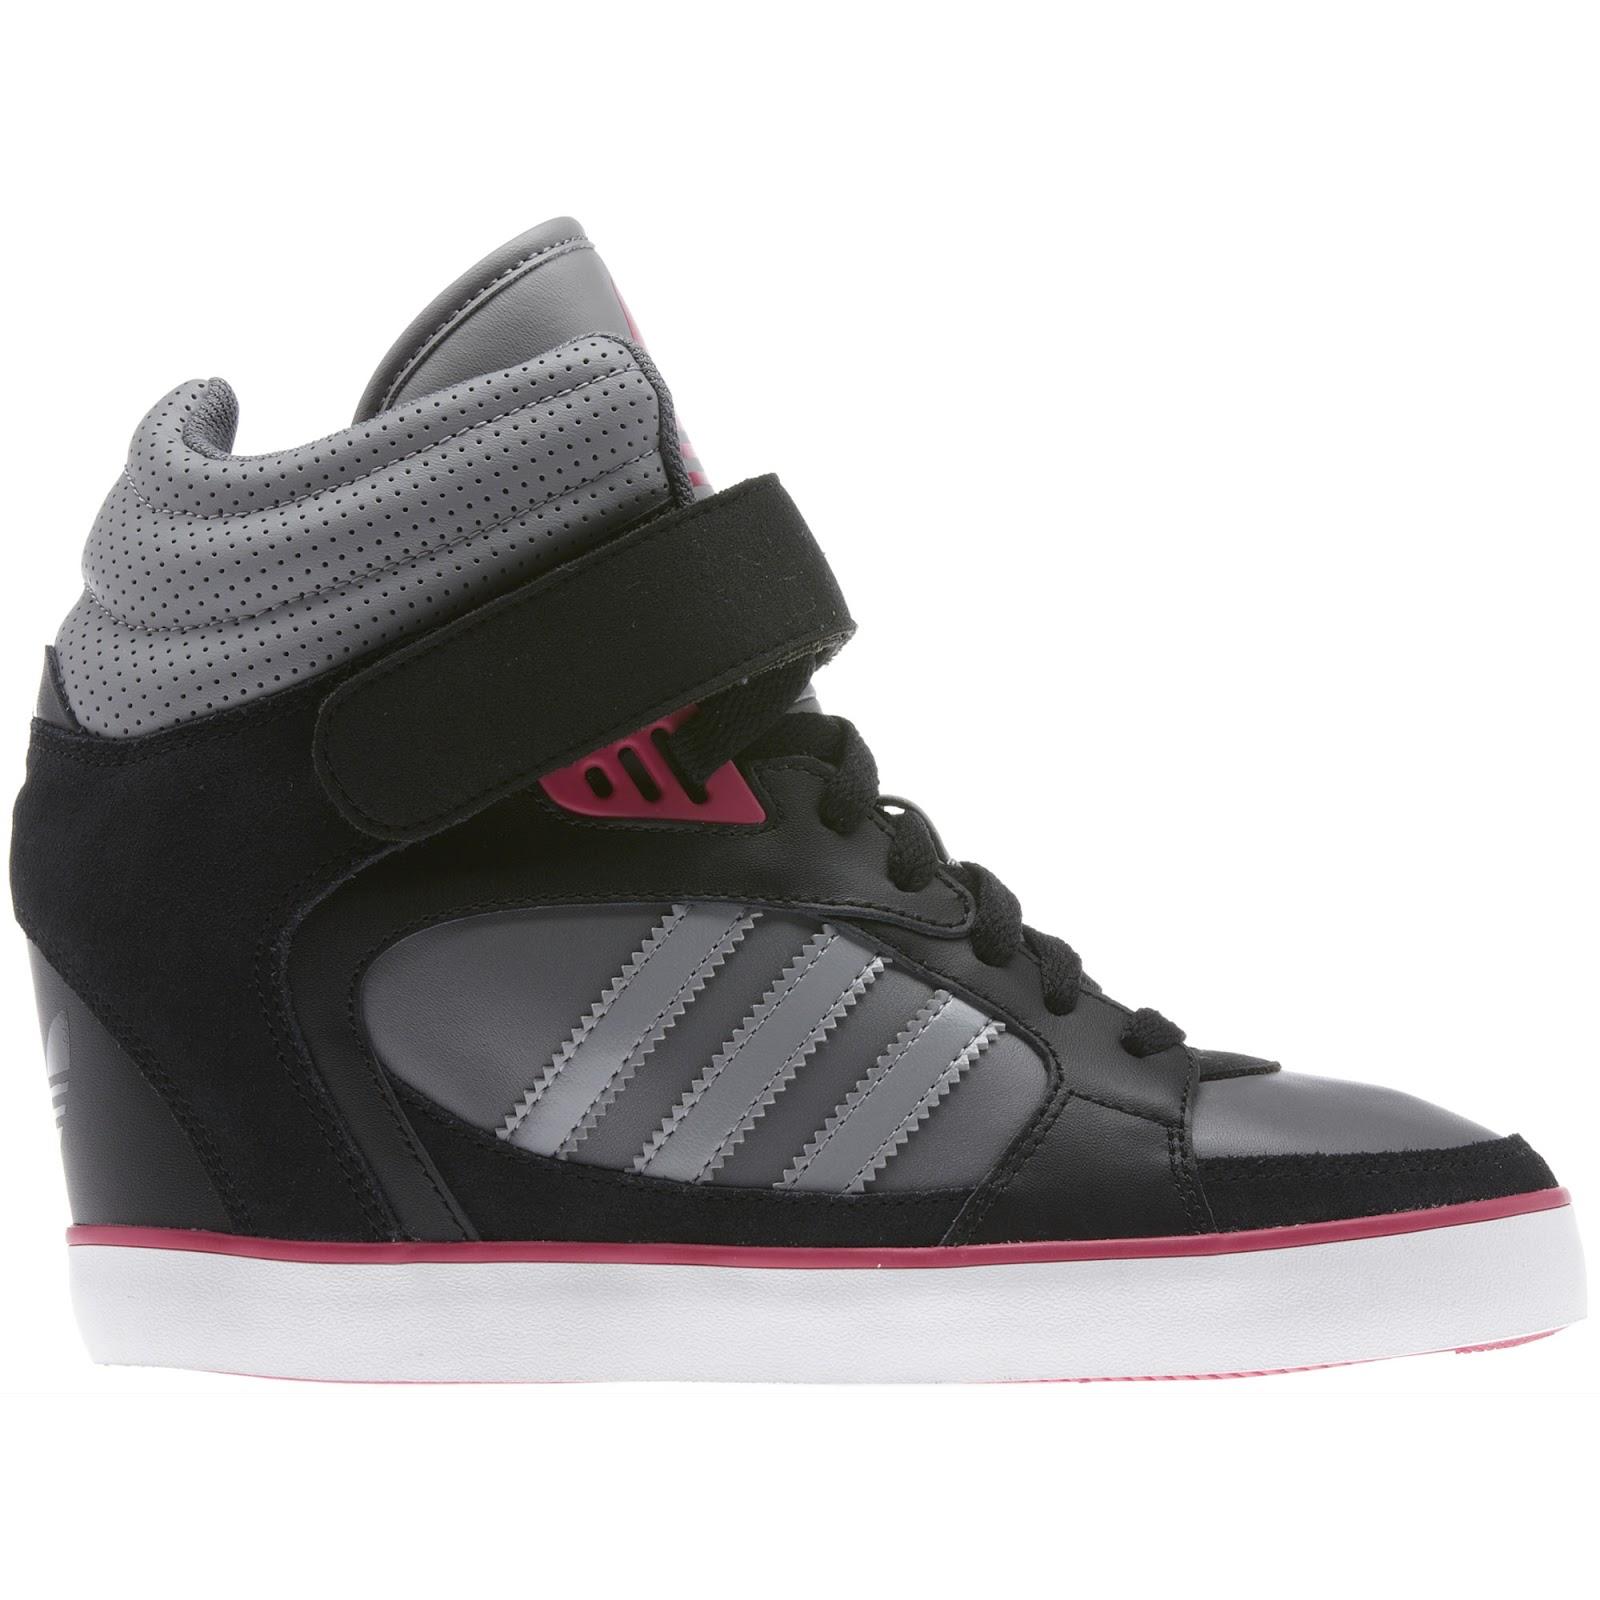 Adidas Wedge-Heeled Sneakers - Cars & Life Blog